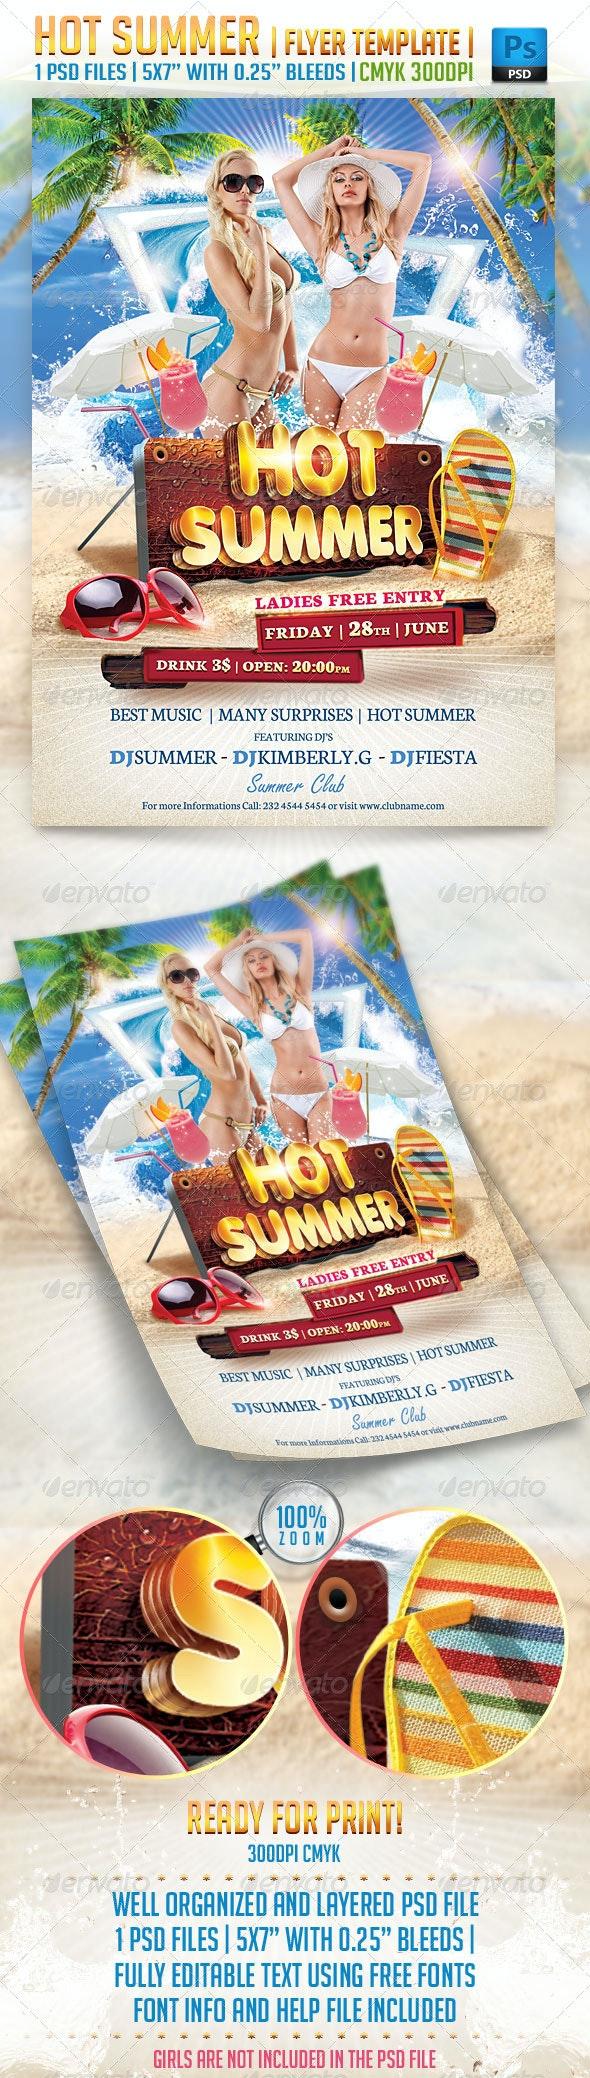 Hot Summer Flyer Template - Clubs & Parties Events